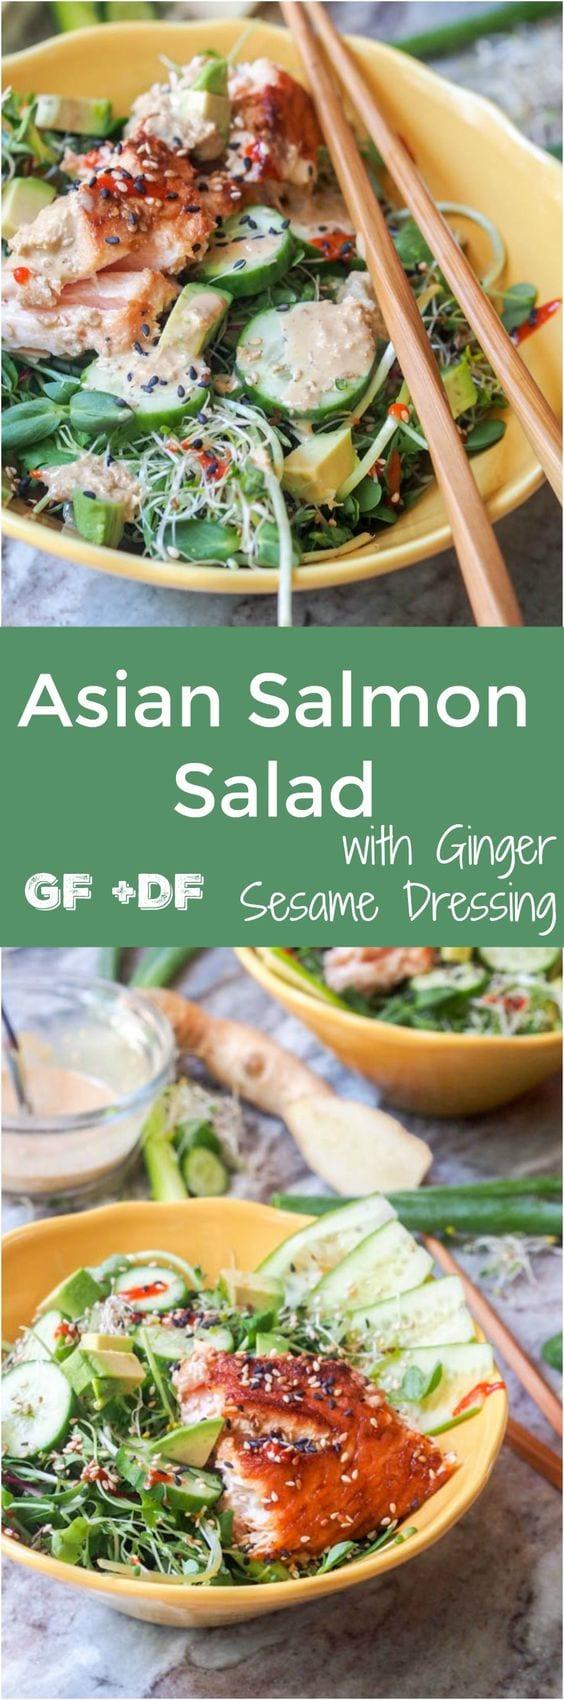 asian salmon salad pin